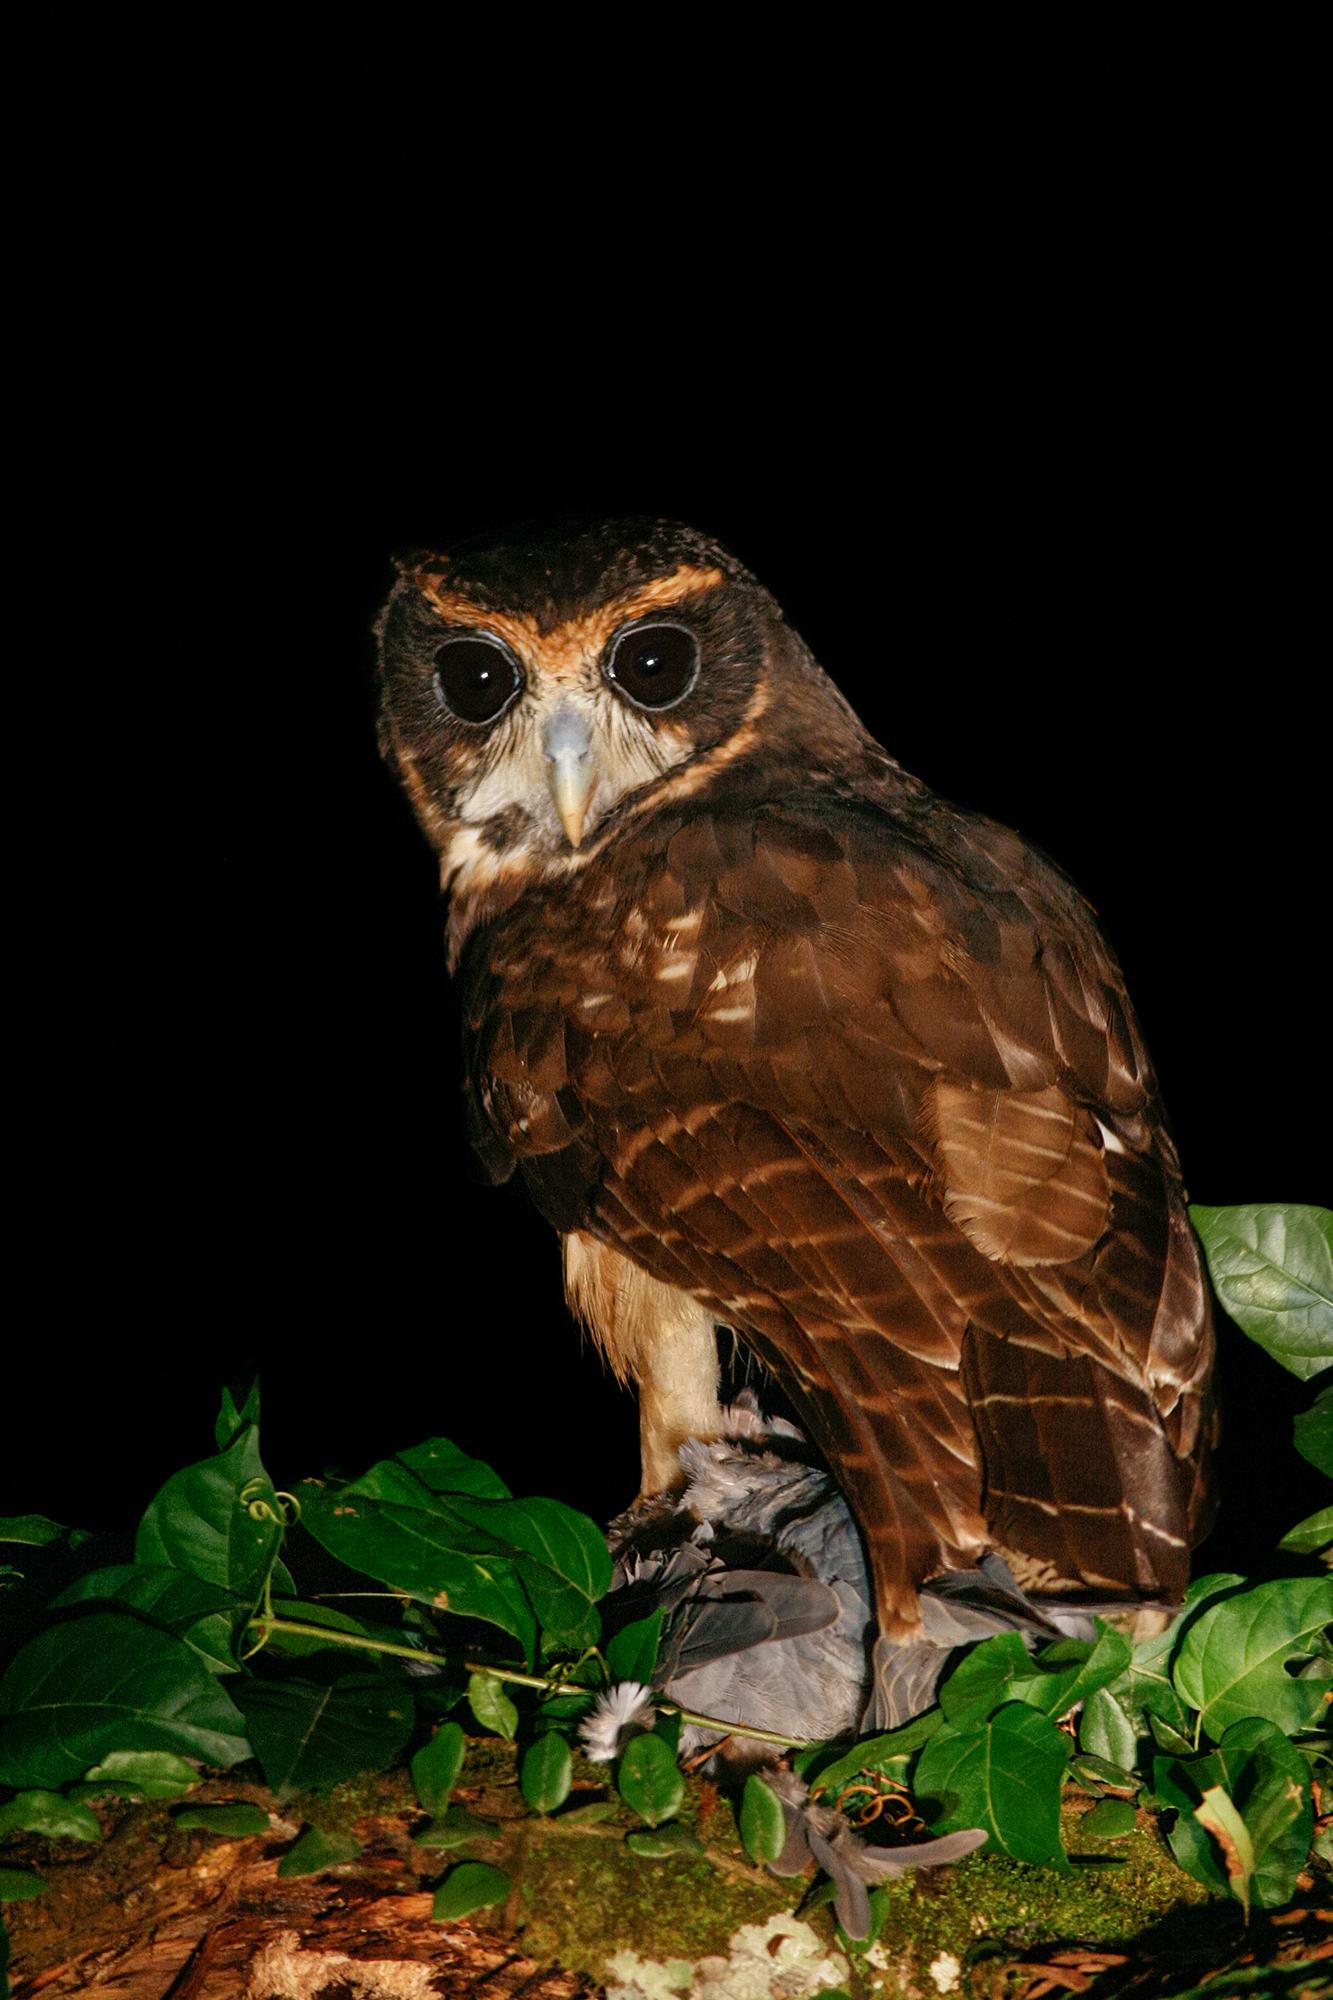 Tawny-browed Owl JPEG_web.jpg